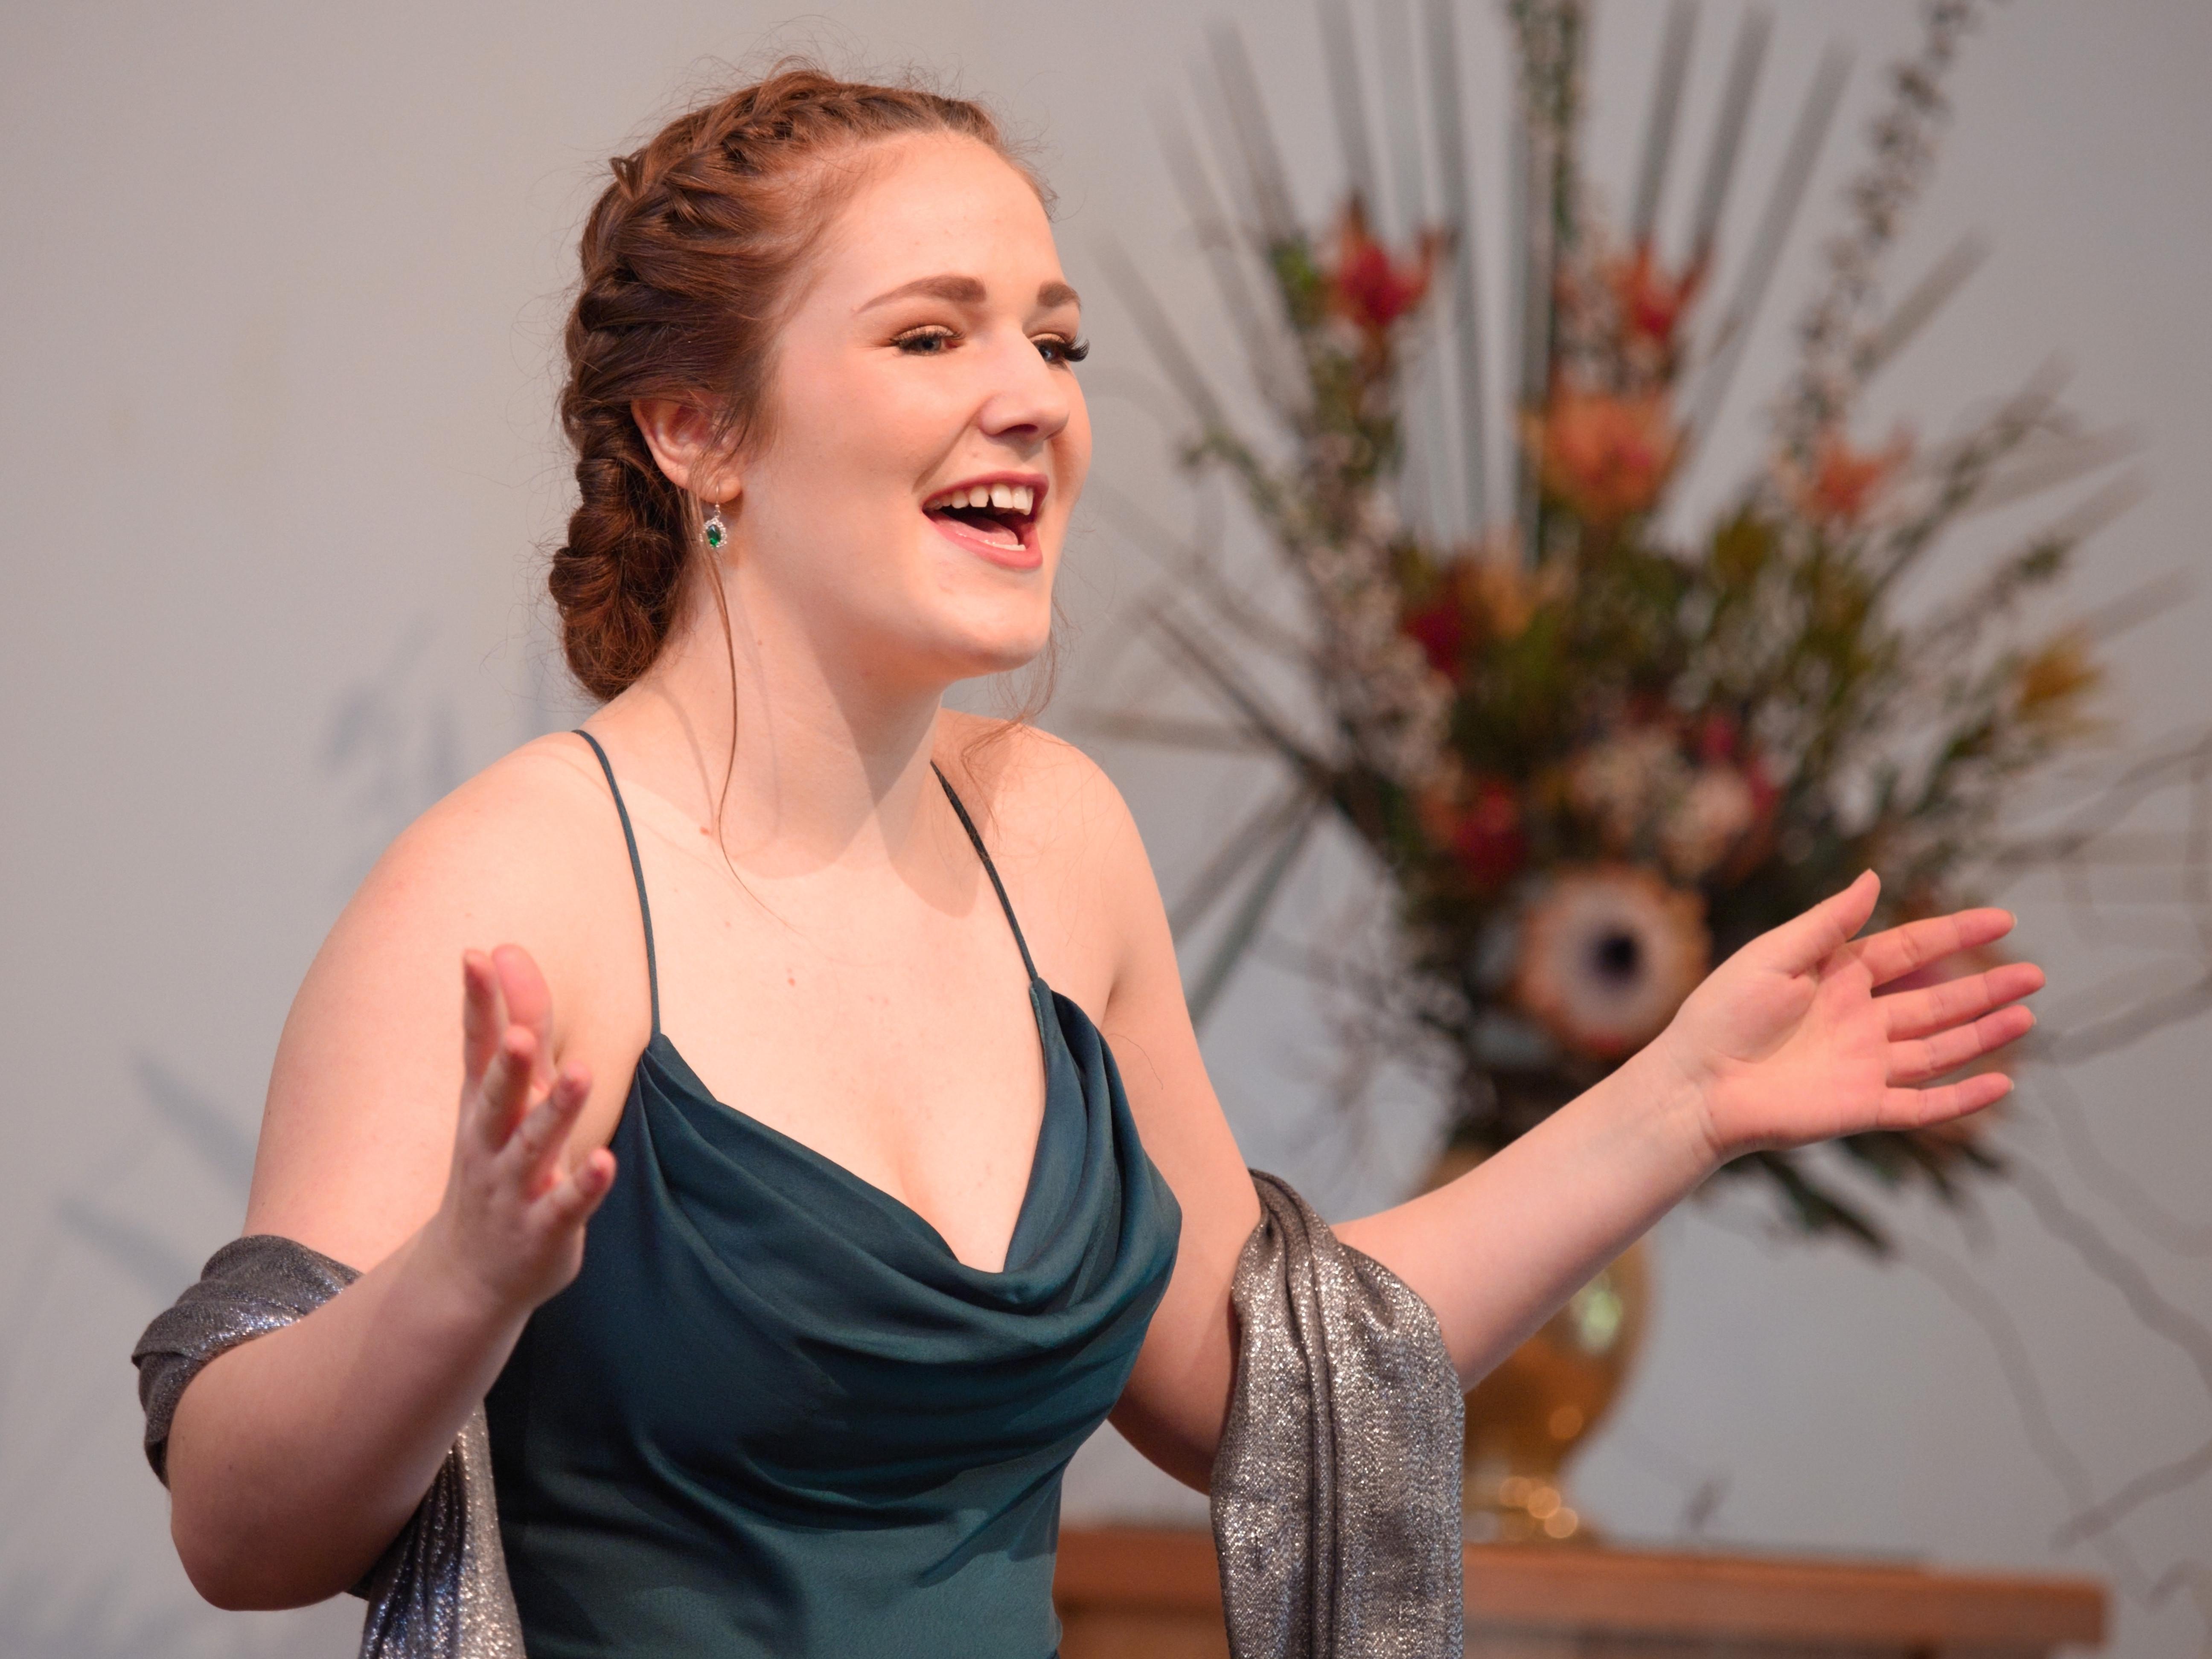 WGE Classical Vocal Christina Keen Performs